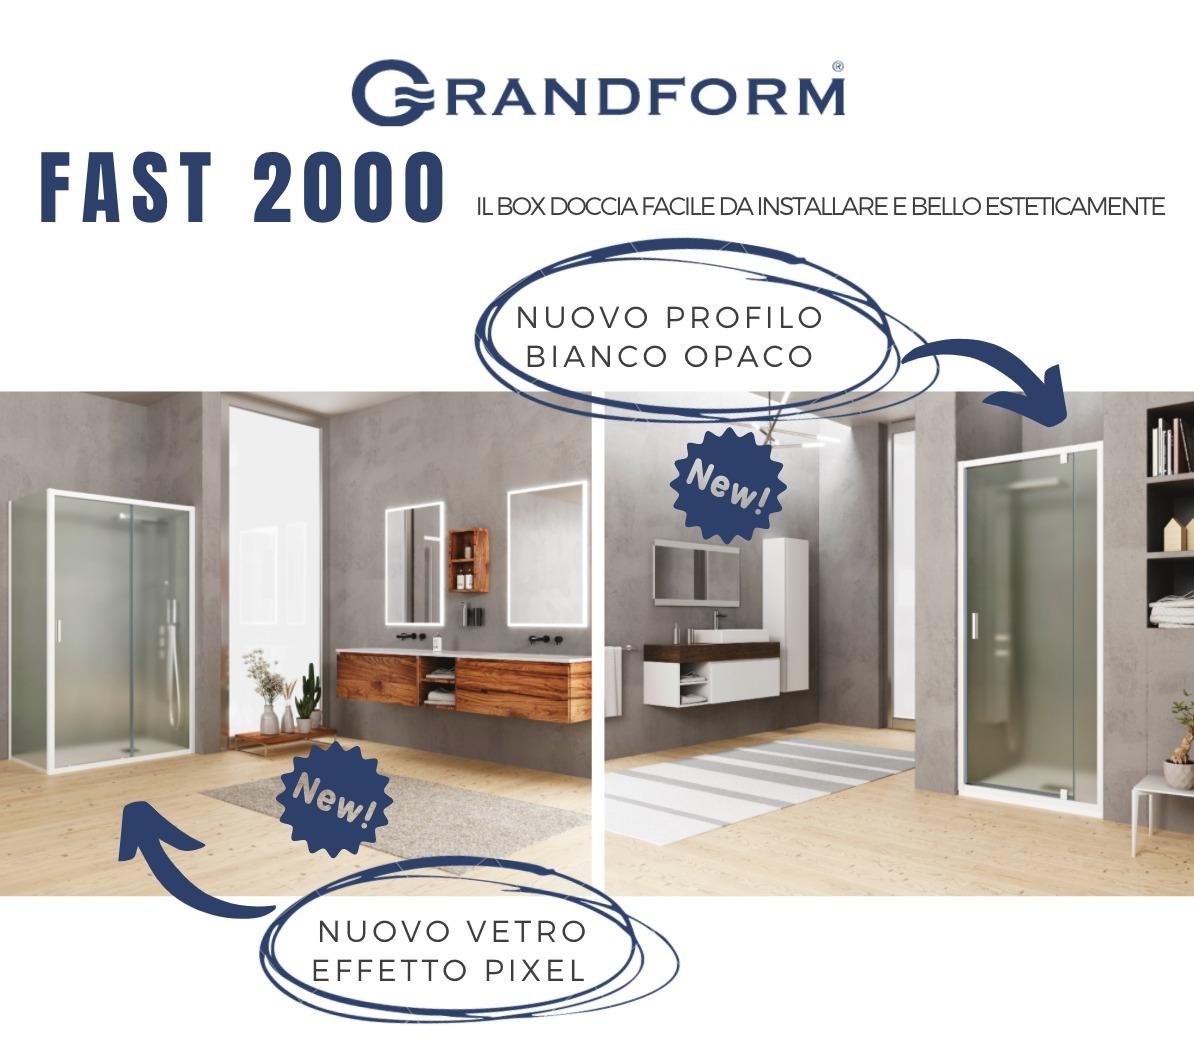 grandform fast 2000